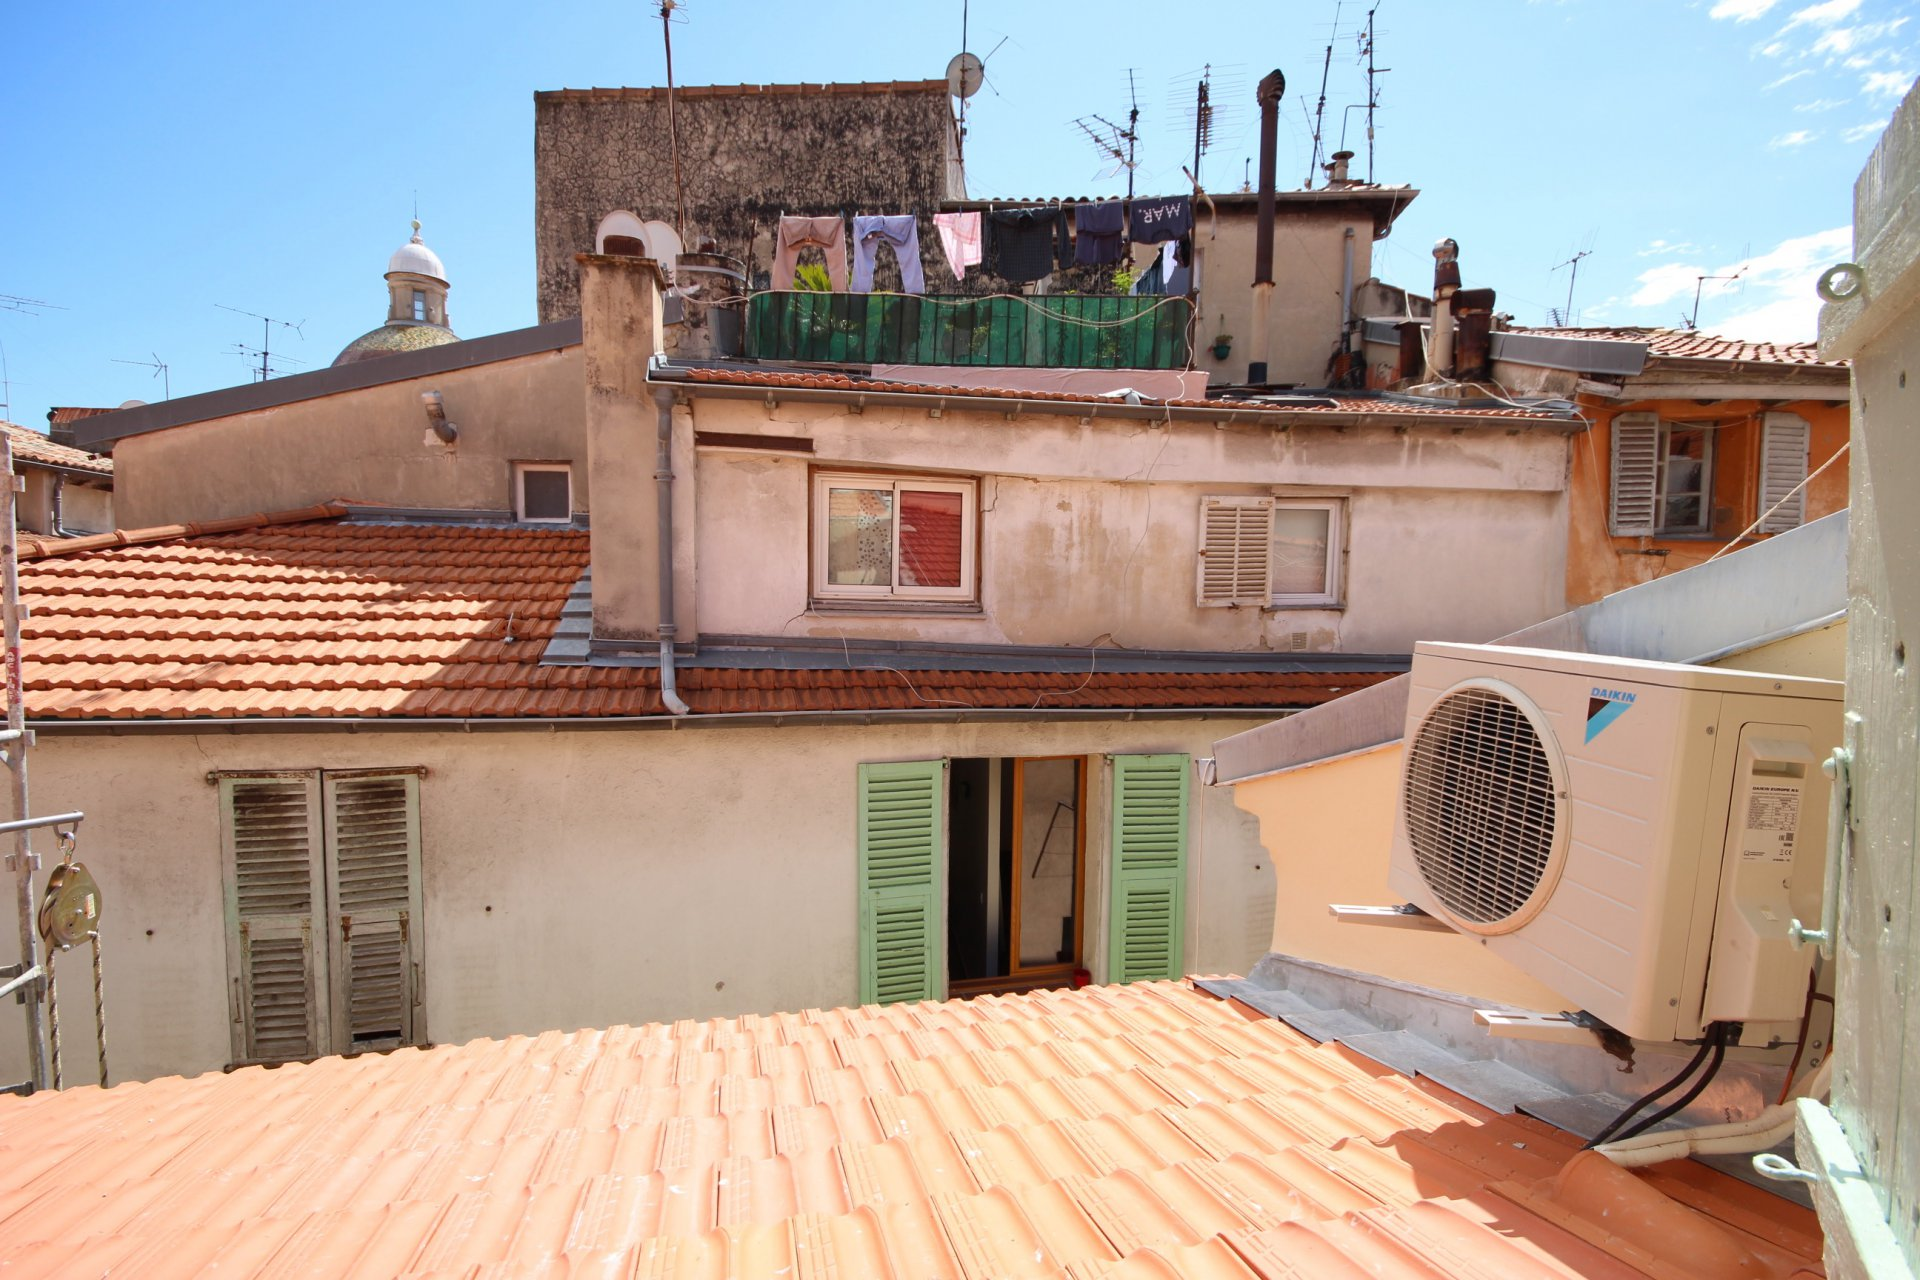 A vendre, Studio, Nice centre - Vieux Nice